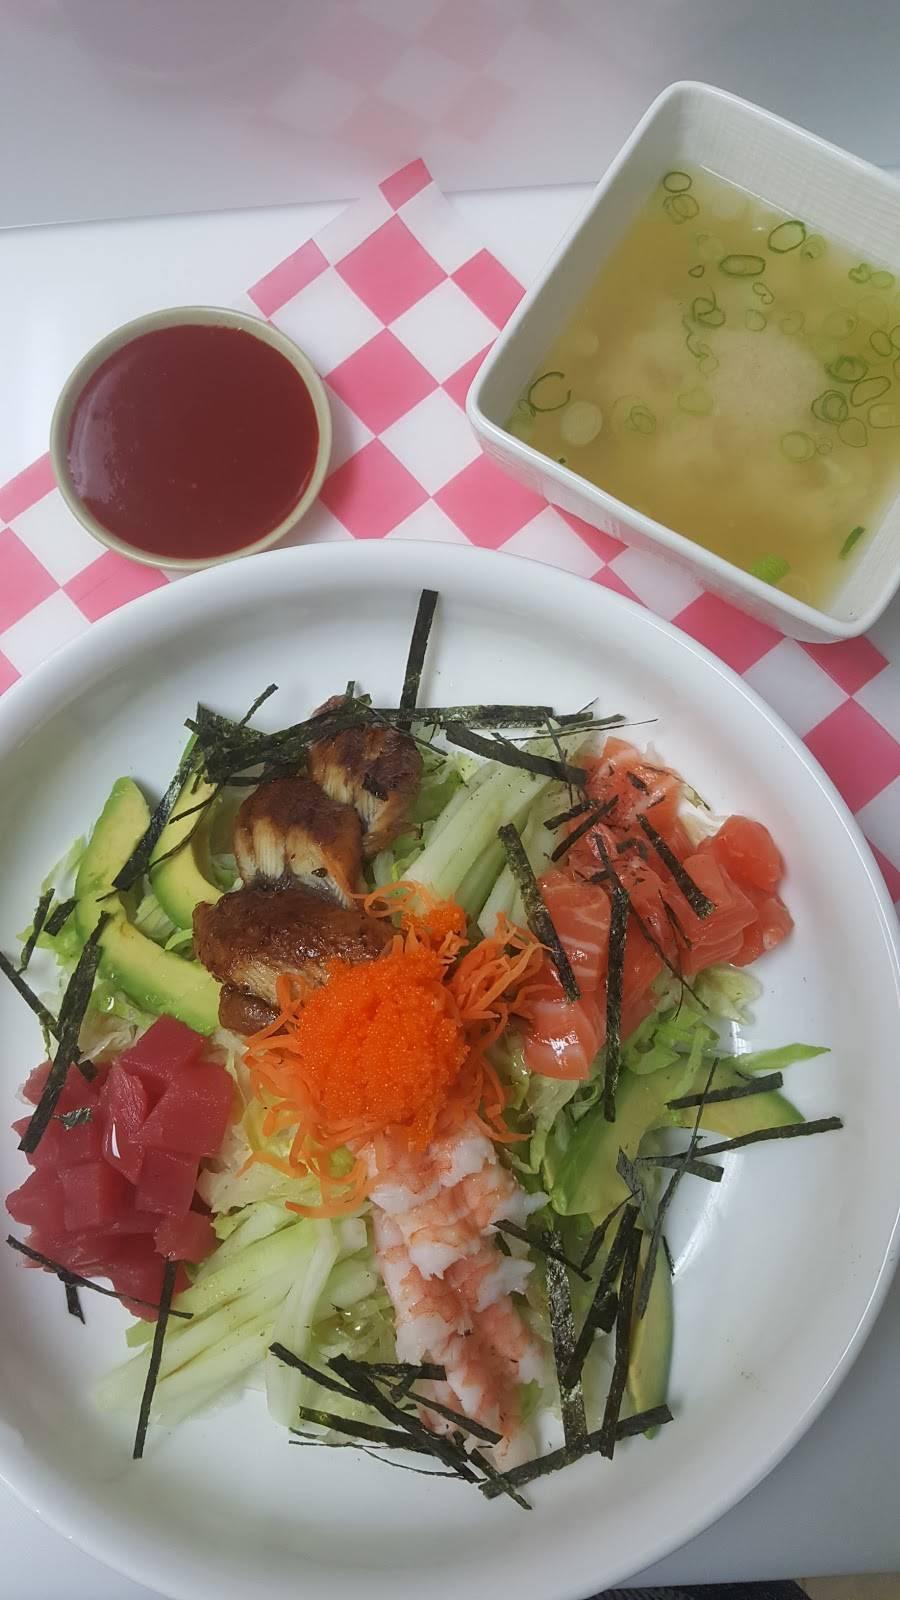 40 West Cafe | restaurant | 40 West St #1, Vernon, CT 06066, USA | 8608703992 OR +1 860-870-3992